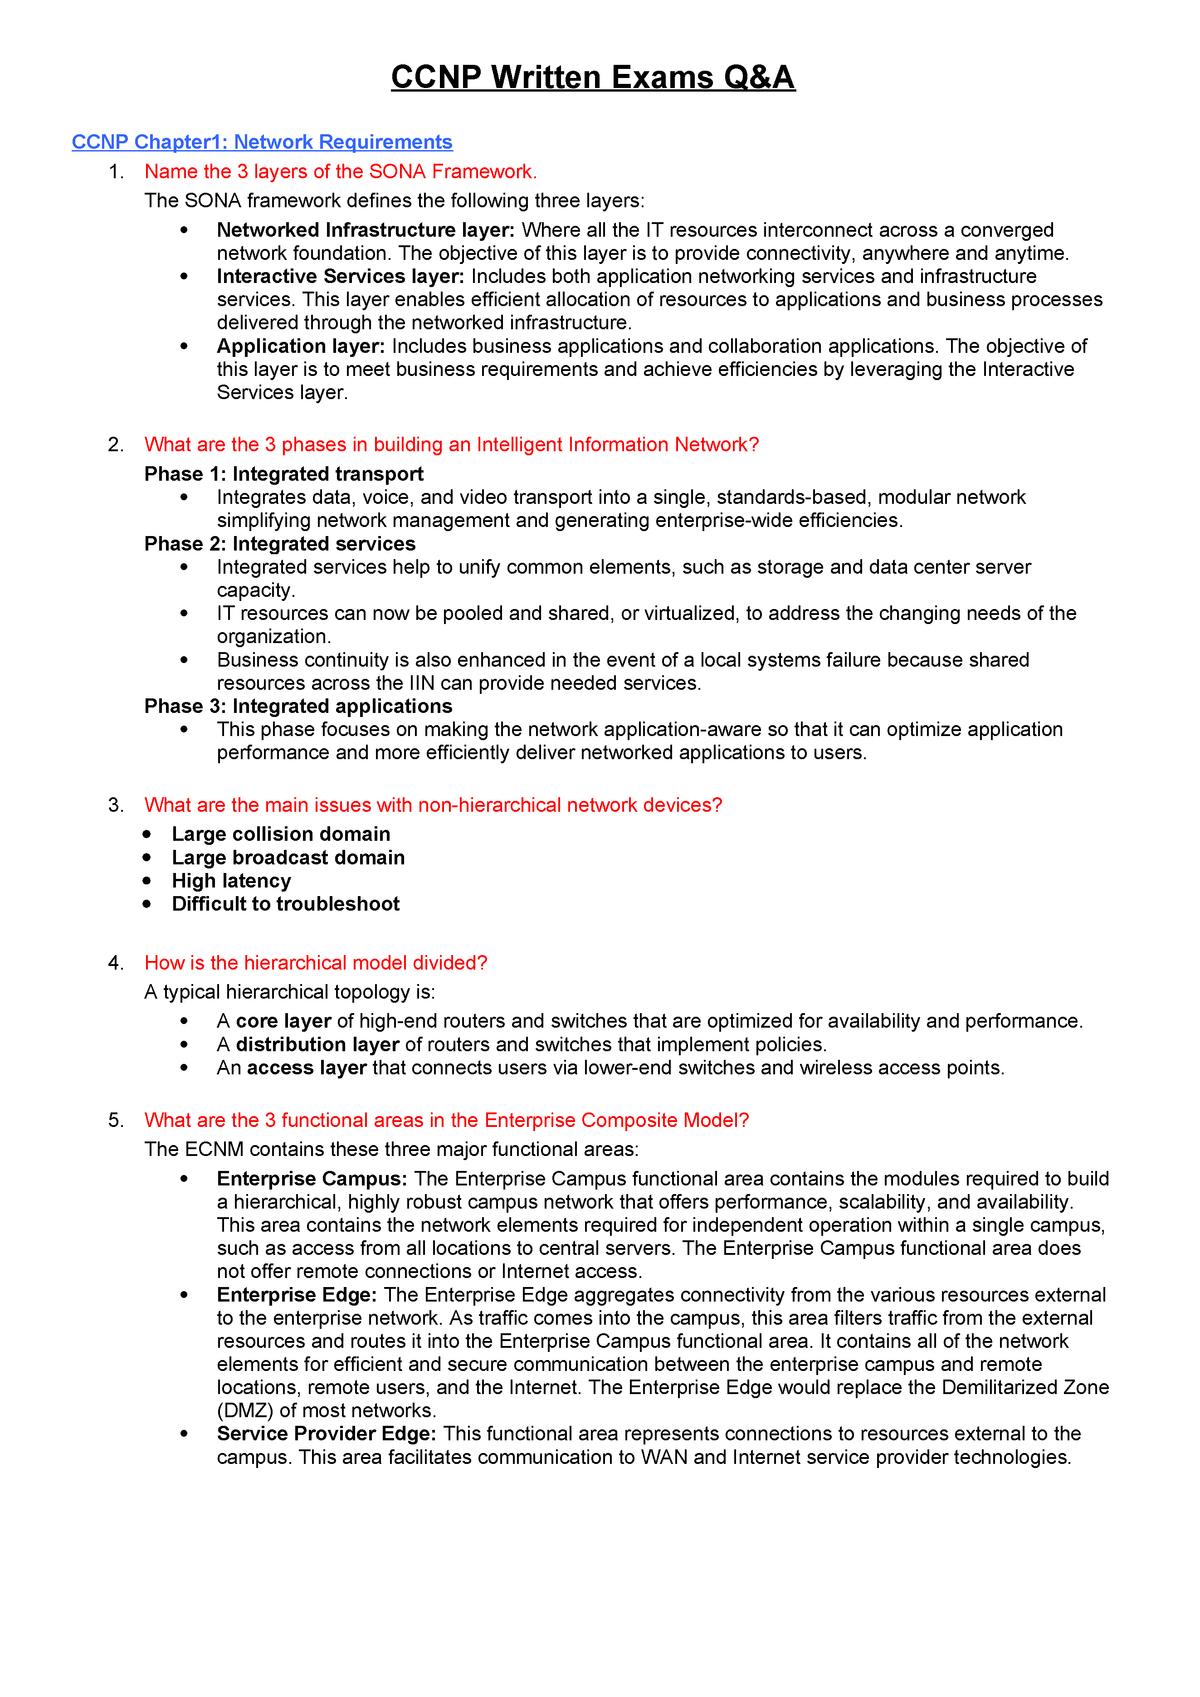 CCNP written exams q&a - chapter 1-7 - EEET2326: Scalable Internet